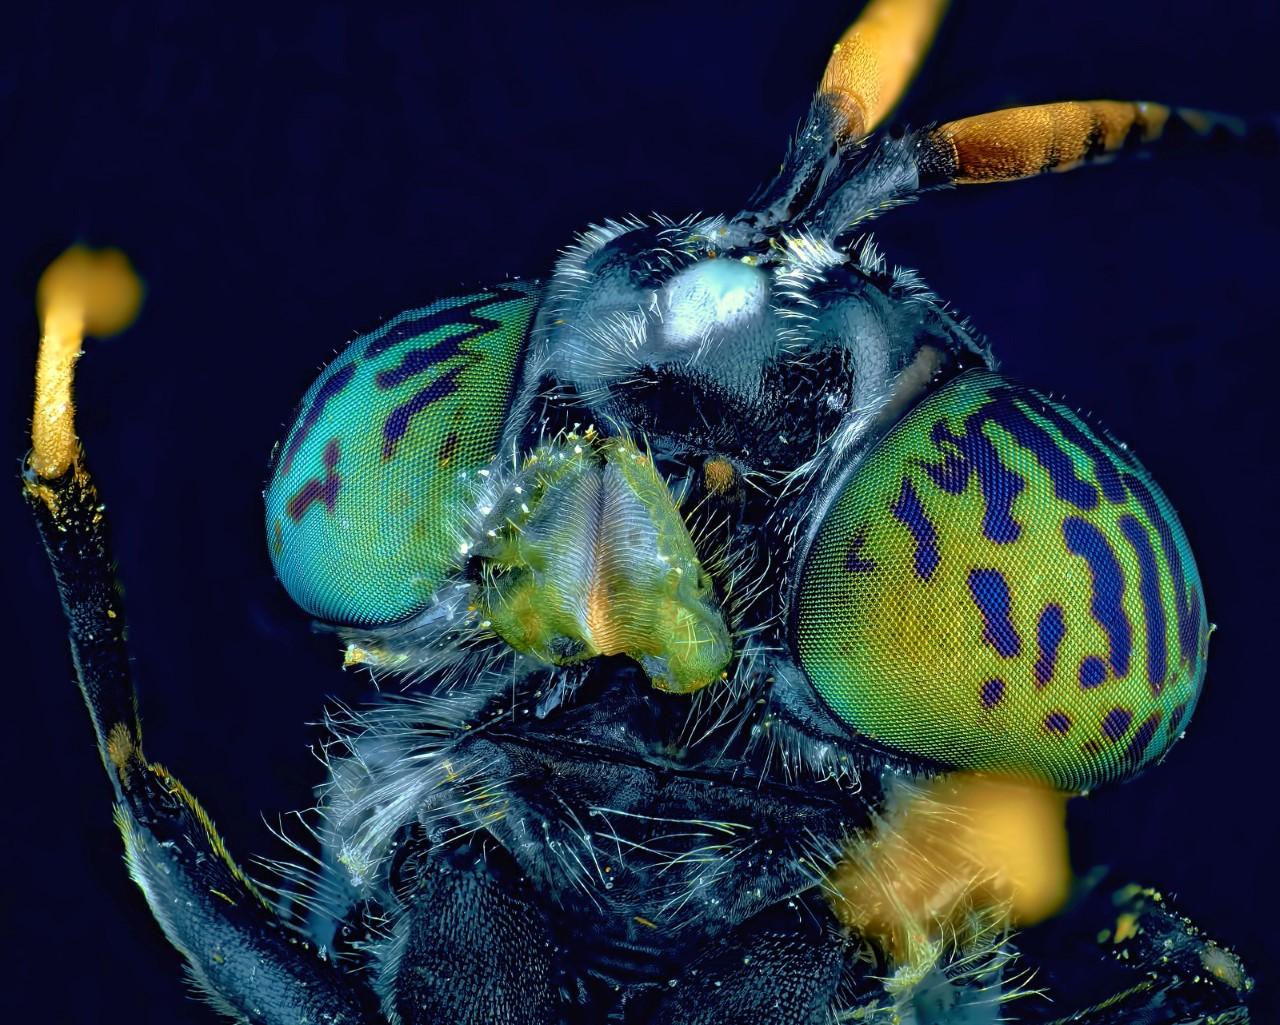 O Μάικλ Γκριμπκόφ από τη Μόσχα κατέγραψε μια εντυπωσιακή εικόνα ενός είδους μύγας (Hermetia illucens) με έντονο μαύρο χρώμα και μεταλλικές αποχρώσεις, η οποία έχει καταφέρει να μεταναστεύσει σε όλες τις ηπείρους του πλανήτη και είναι γνωστή ως «μαύρος στρατιώτης»